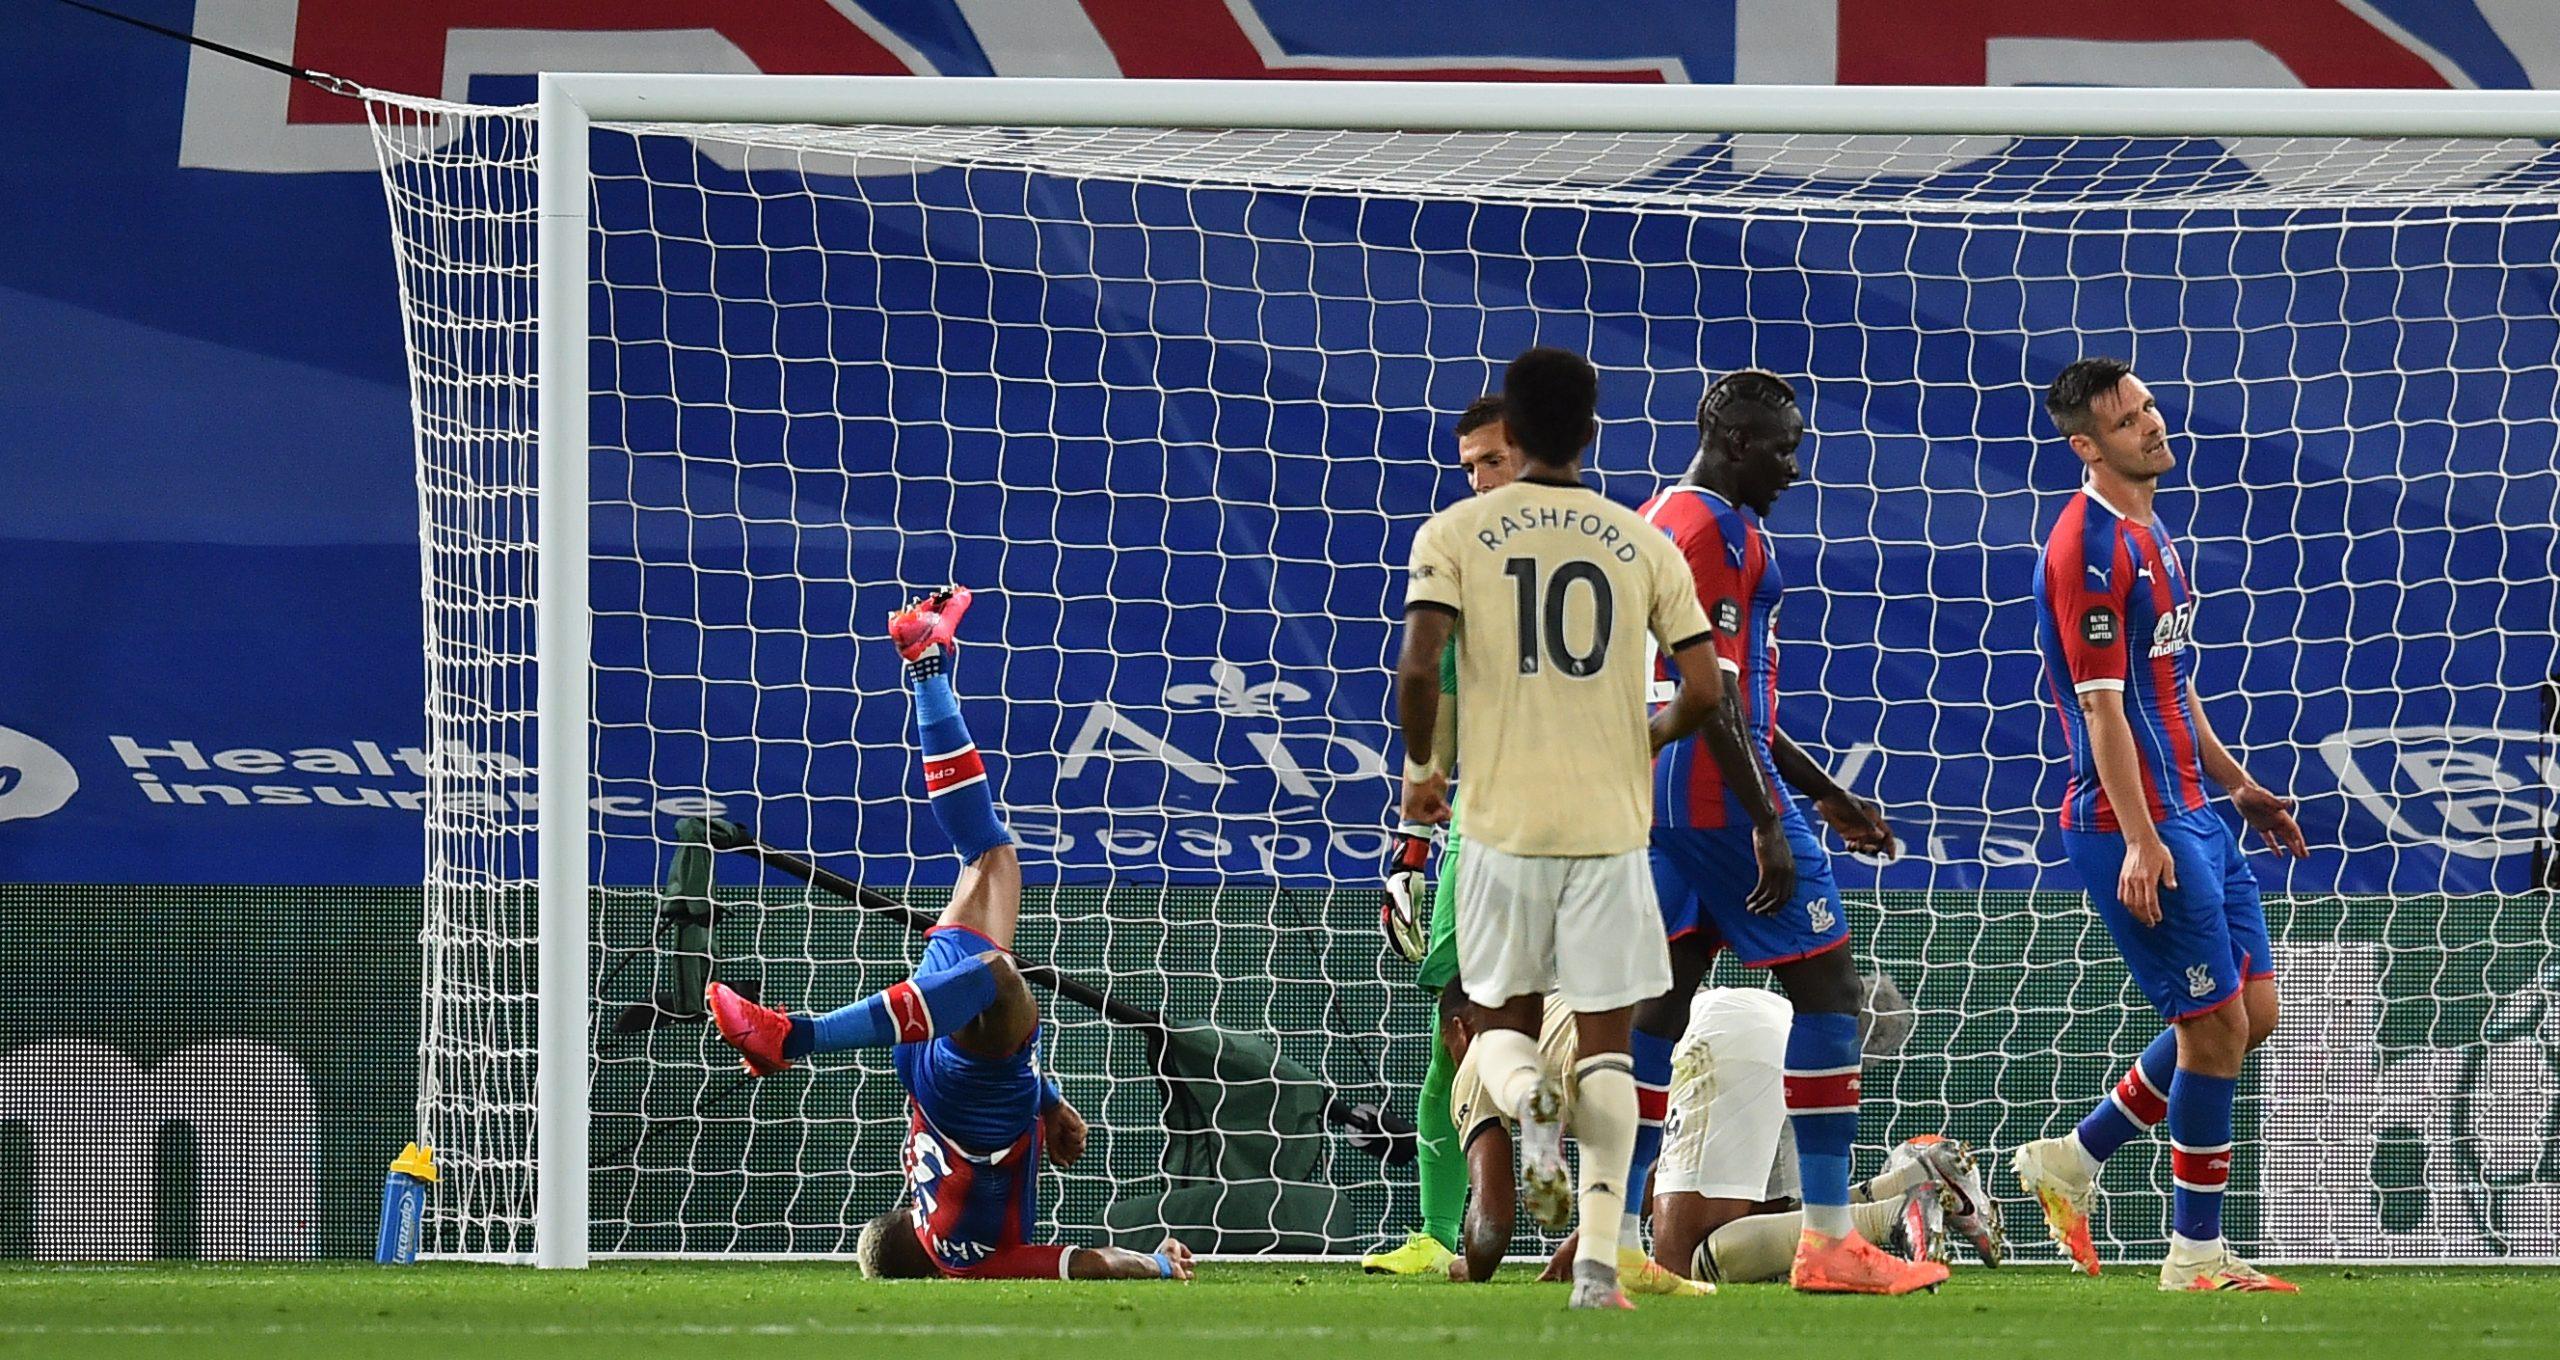 Man Utd - Crystal Palace